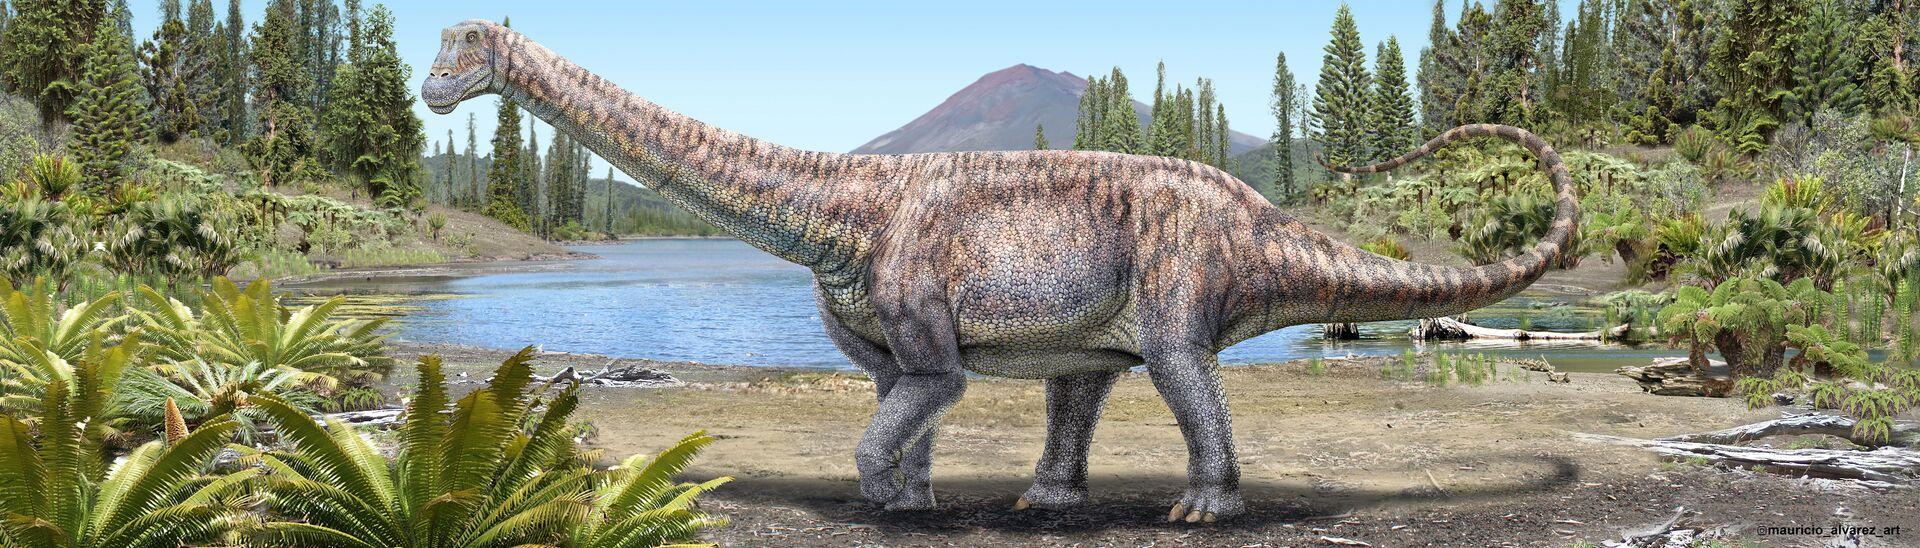 Dinosauro Arackar licanantay - Sputnik Italia, 1920, 18.05.2021